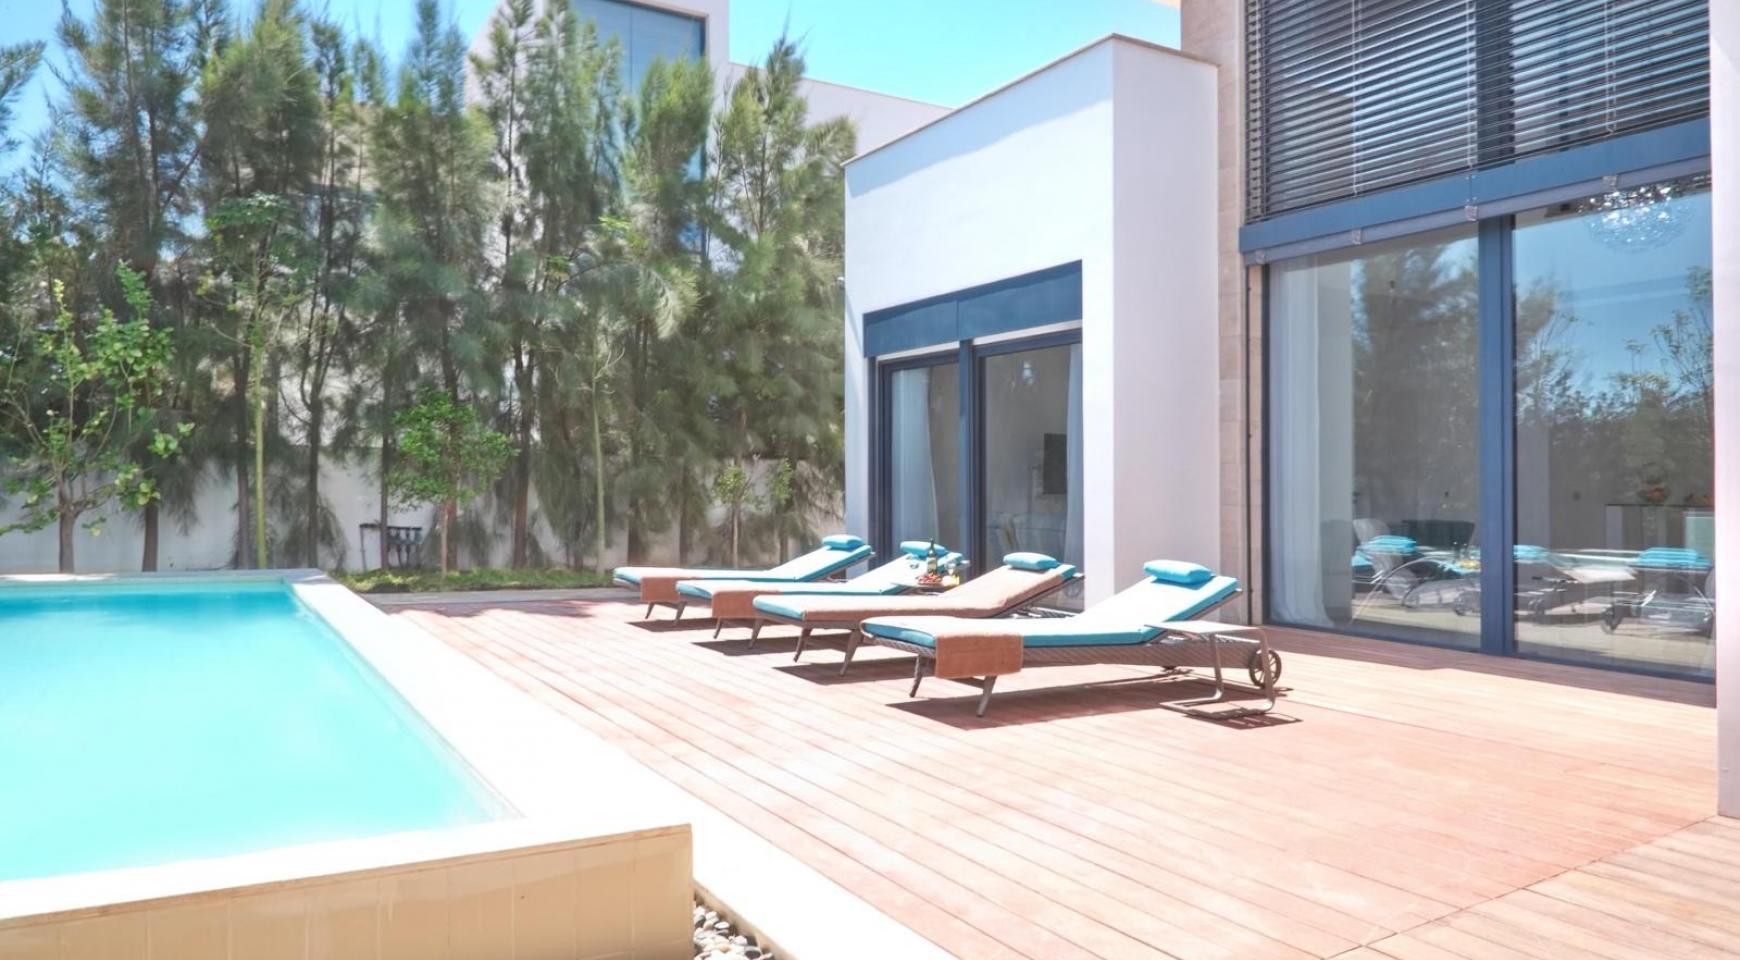 New Luxurious 4 Bedroom Villa in the Tourist Area - 4